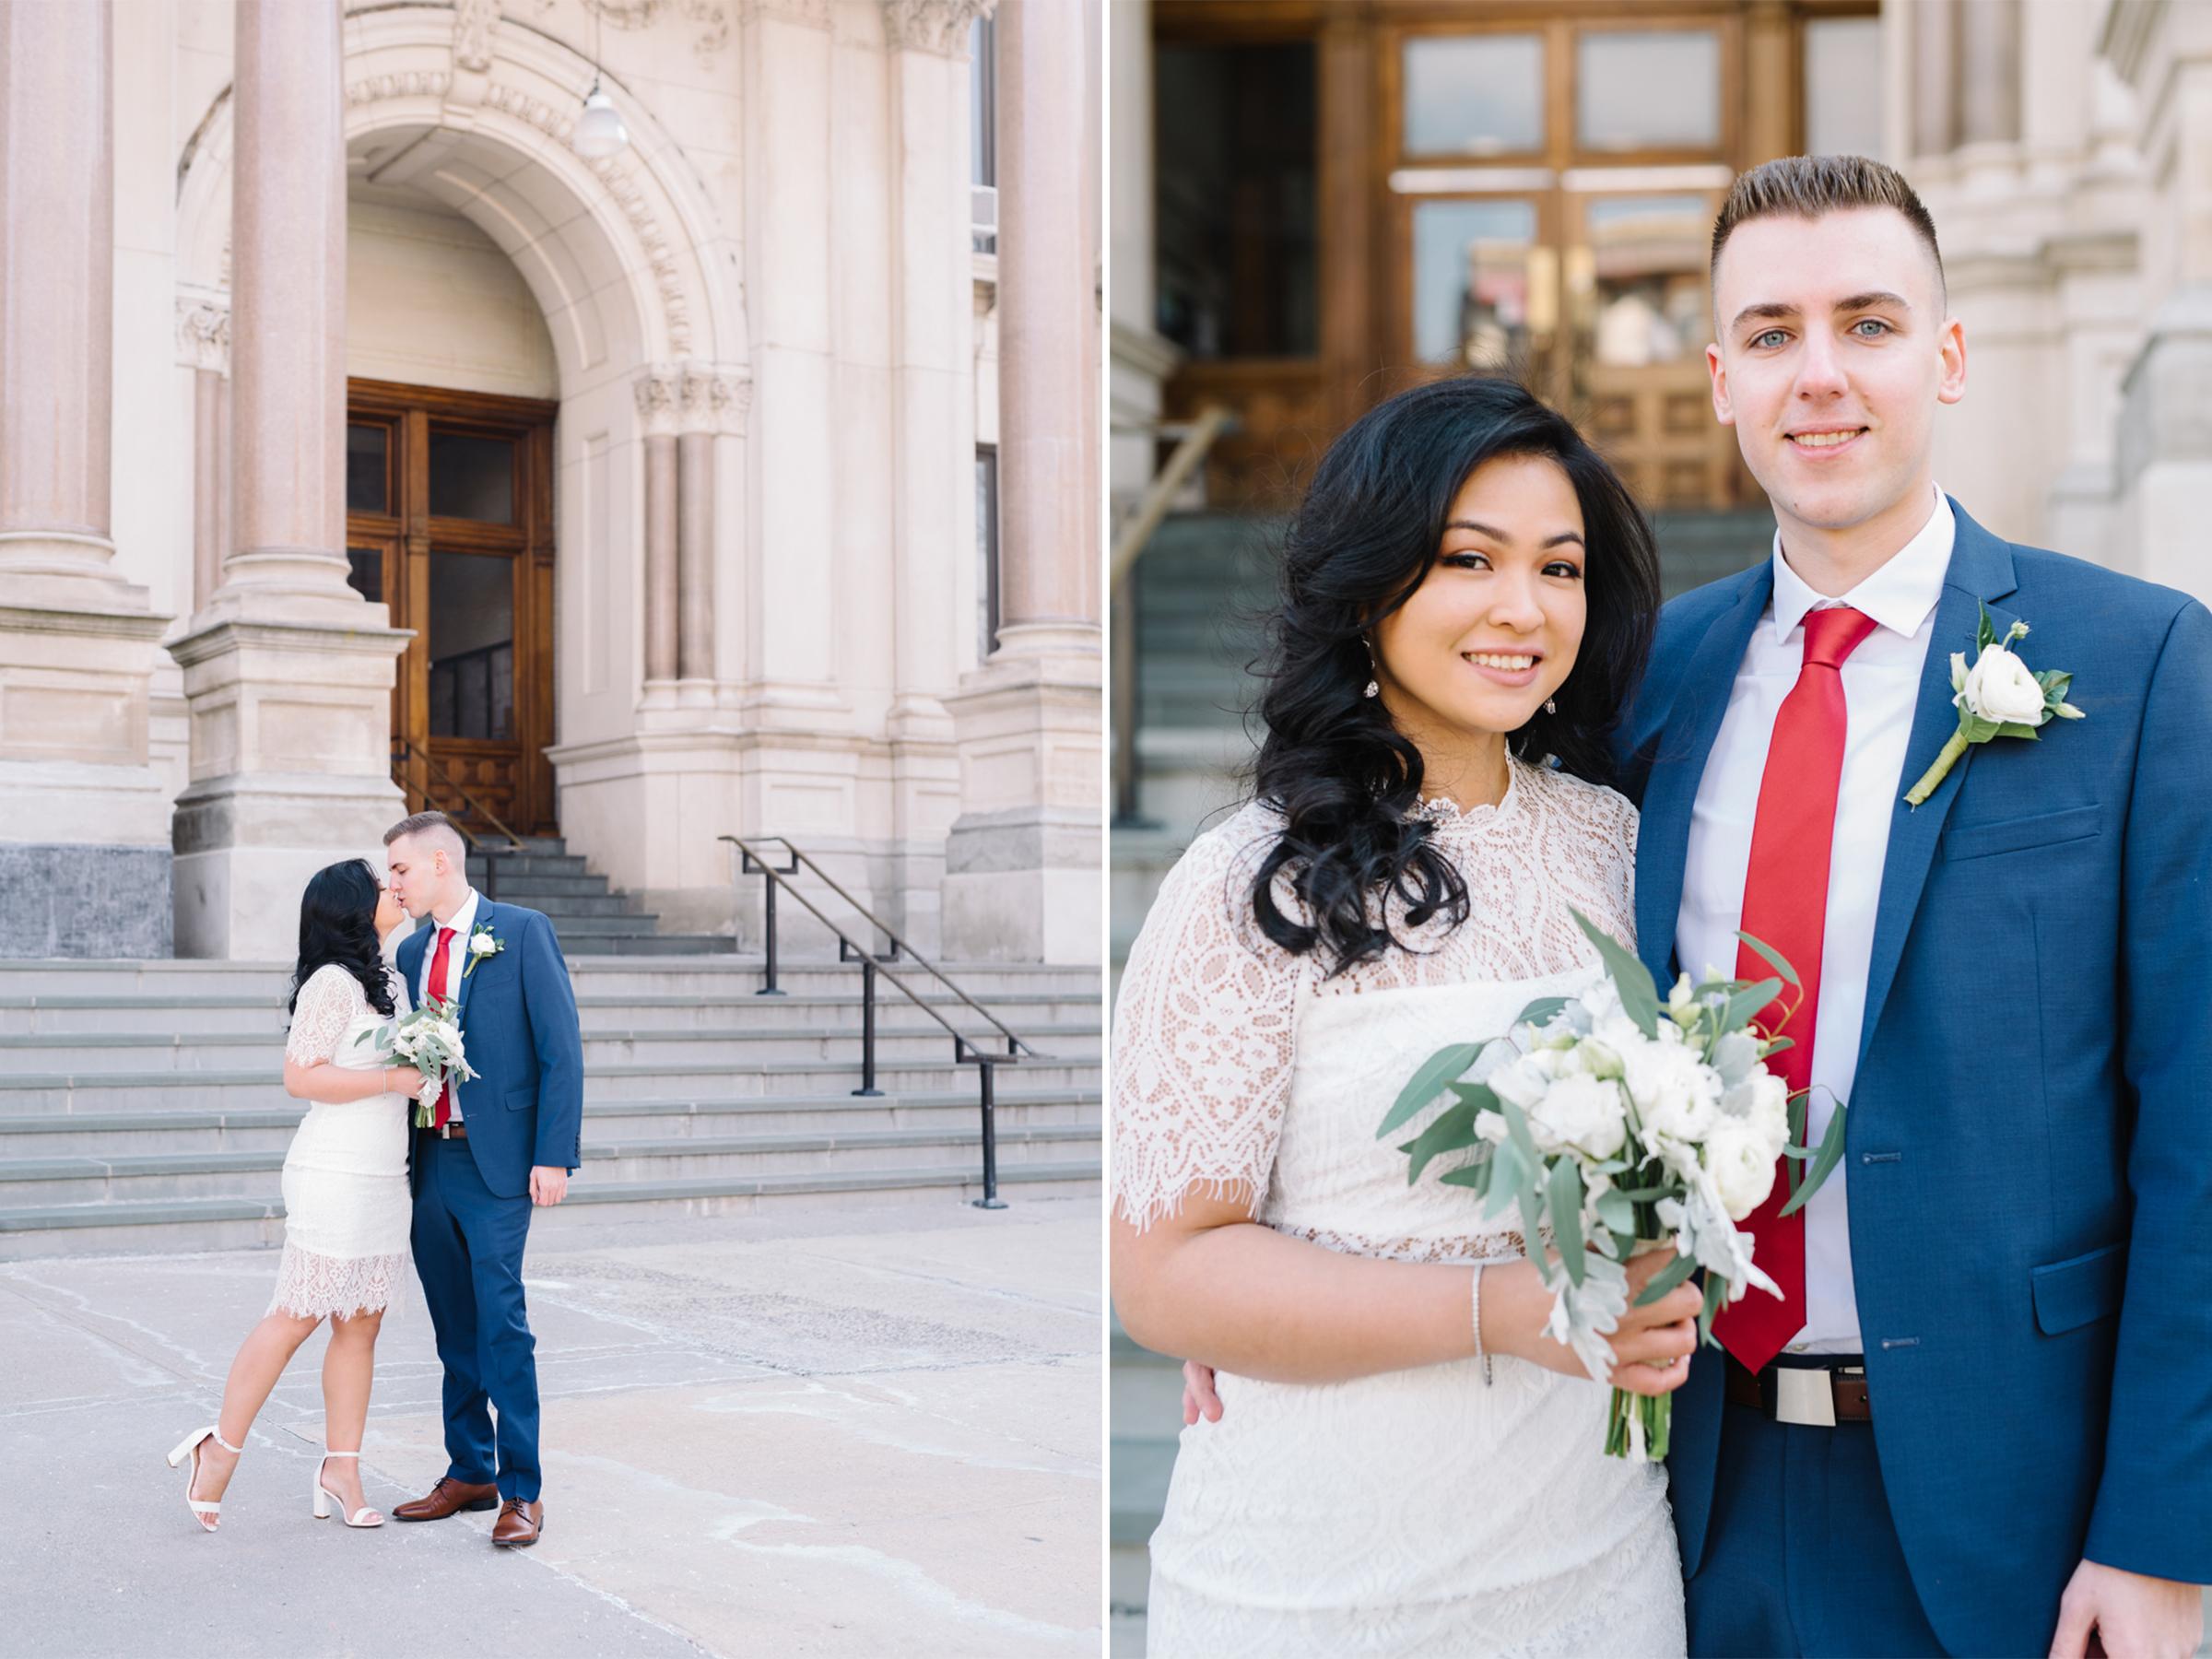 City Hall Wedding- Nichole + Lukasz- Jersey City New Jersey- Olivia Christina Photo.2jpg.jpg